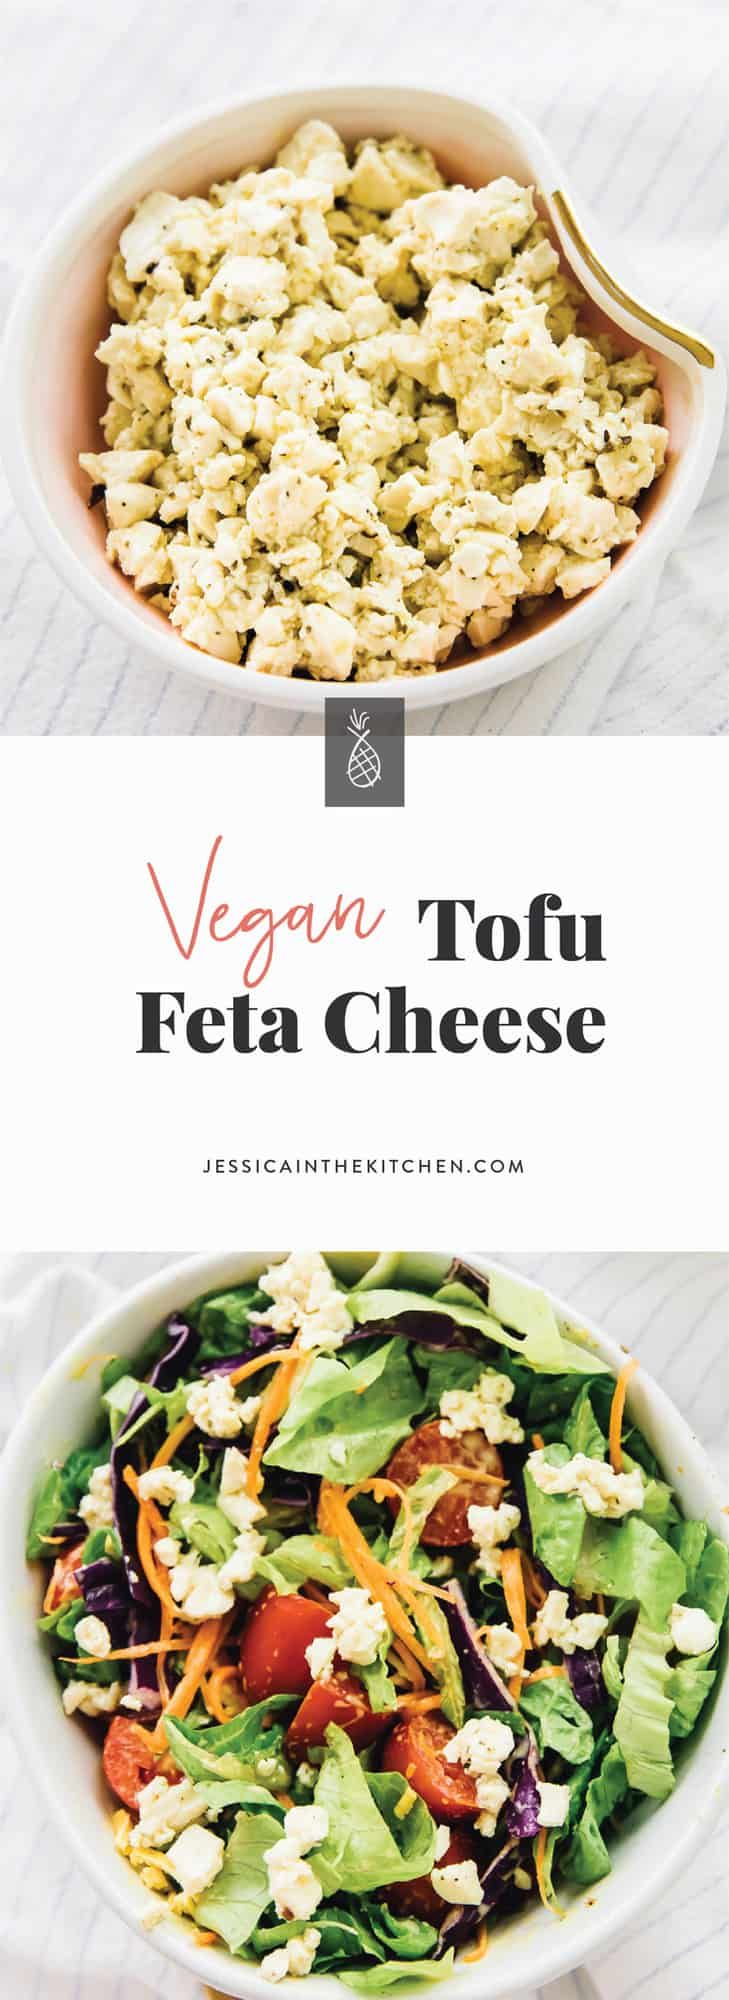 Vegan Tofu Feta Cheese Jessica In The Kitchen Tofu Recipes Vegan Tofu Feta Vegan Feta Cheese